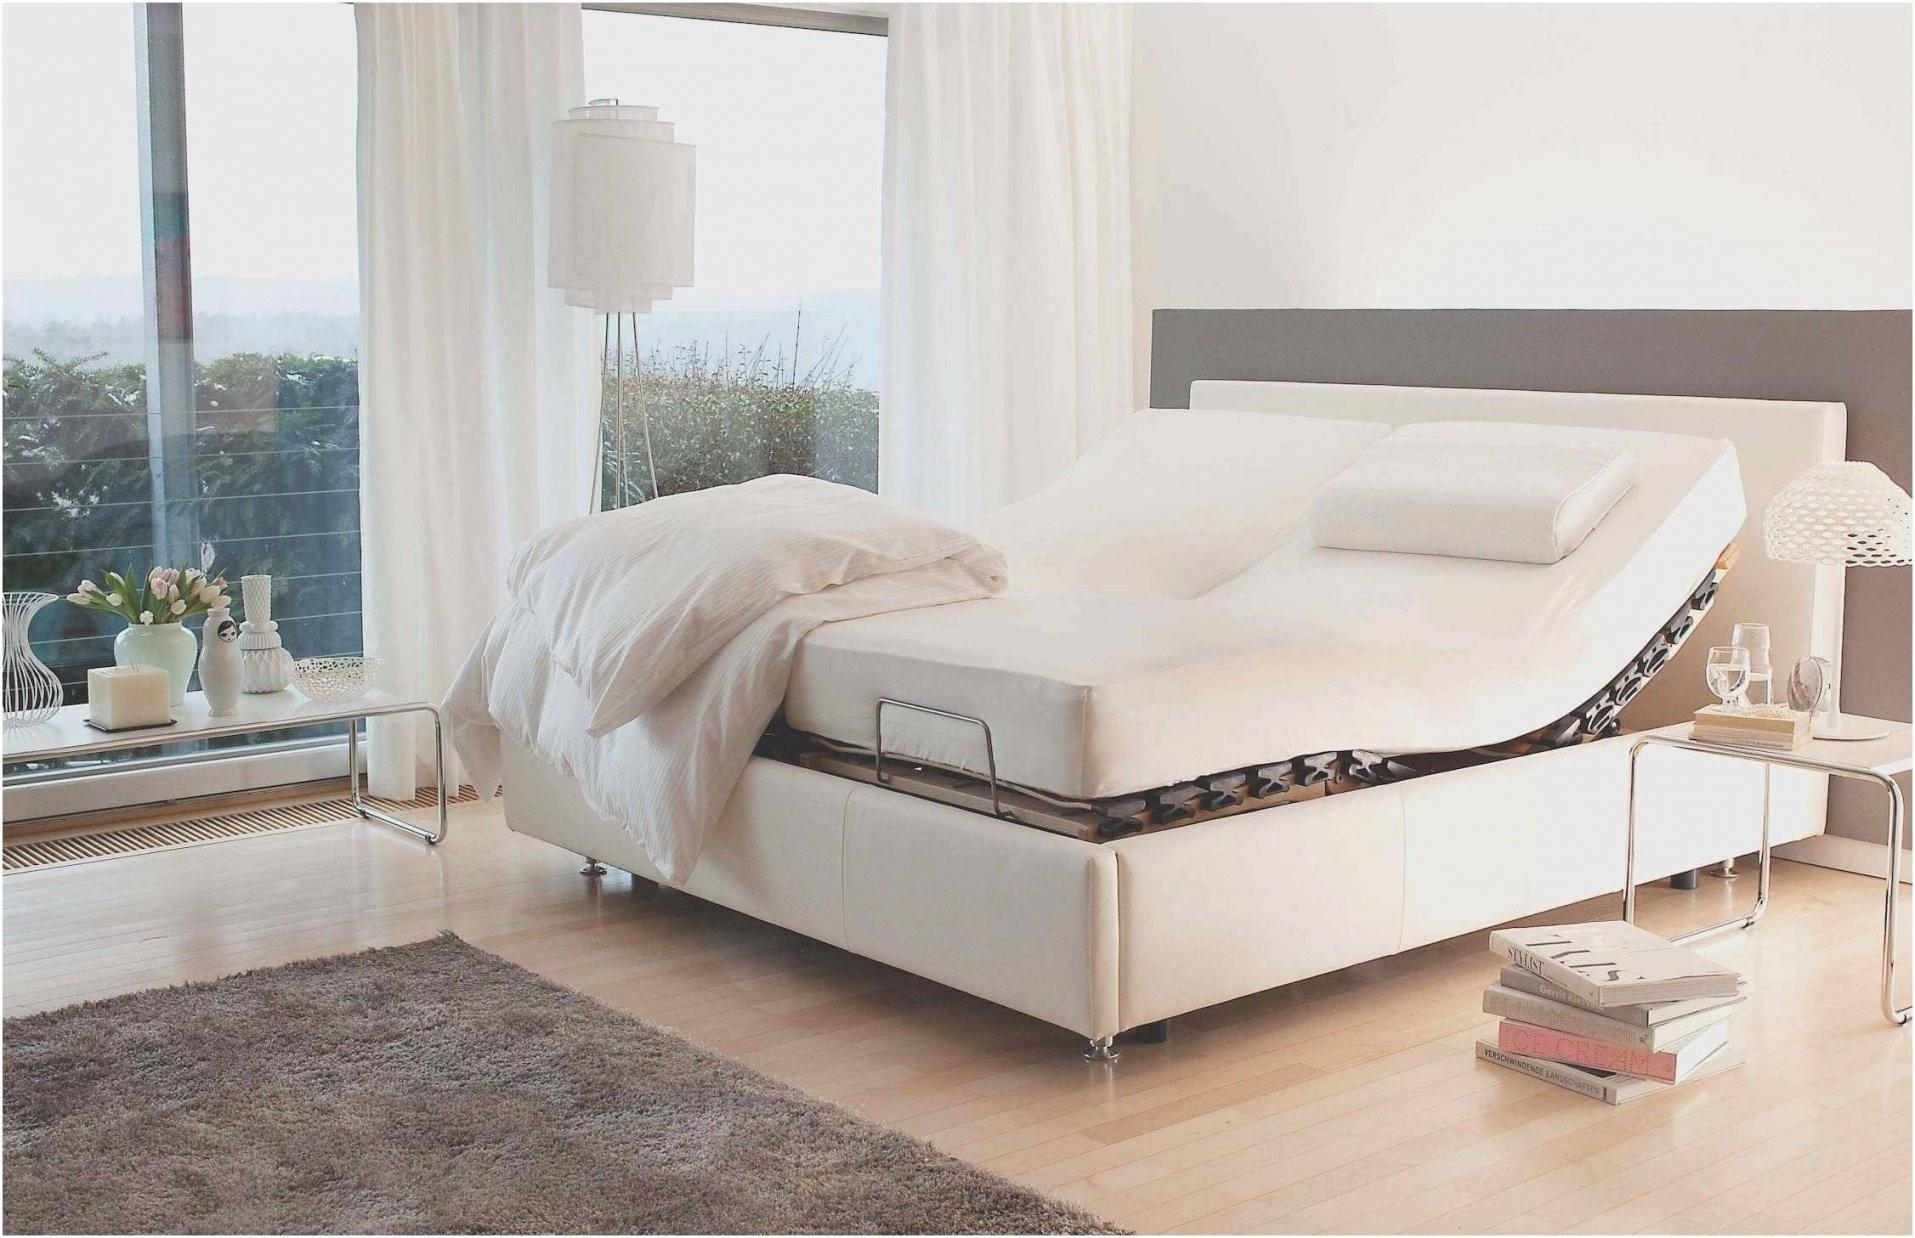 Doppelbett Günstig Neu Tolle 32 Bett Mit Matratze Und Lattenrost 140 von Bett Mit Matratze Und Lattenrost 140X200 Günstig Bild